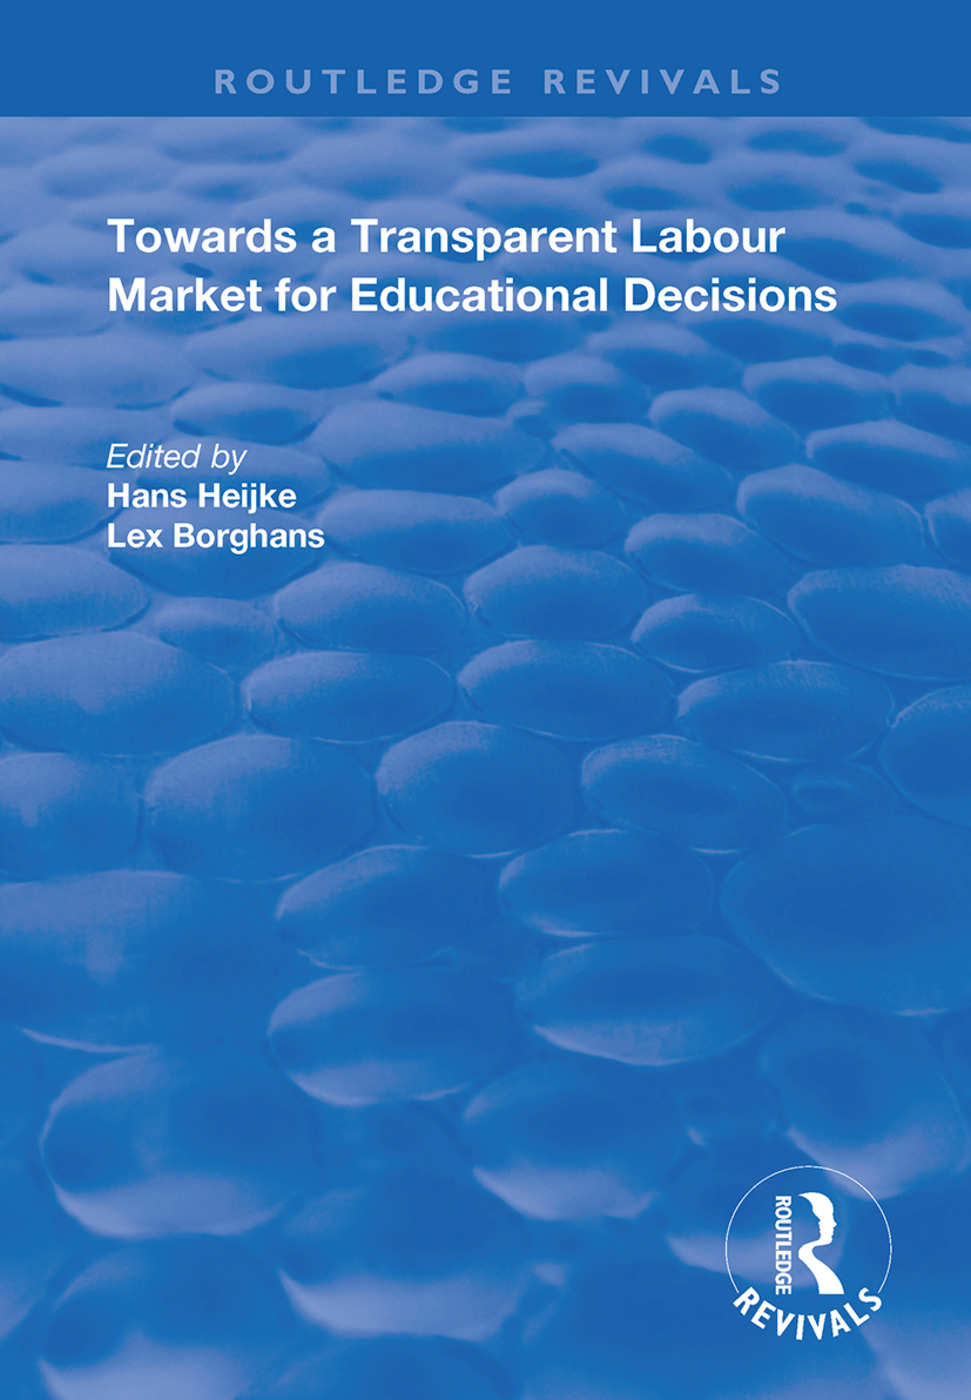 Towards a Transparent Labour Market for Educational Decisions book cover